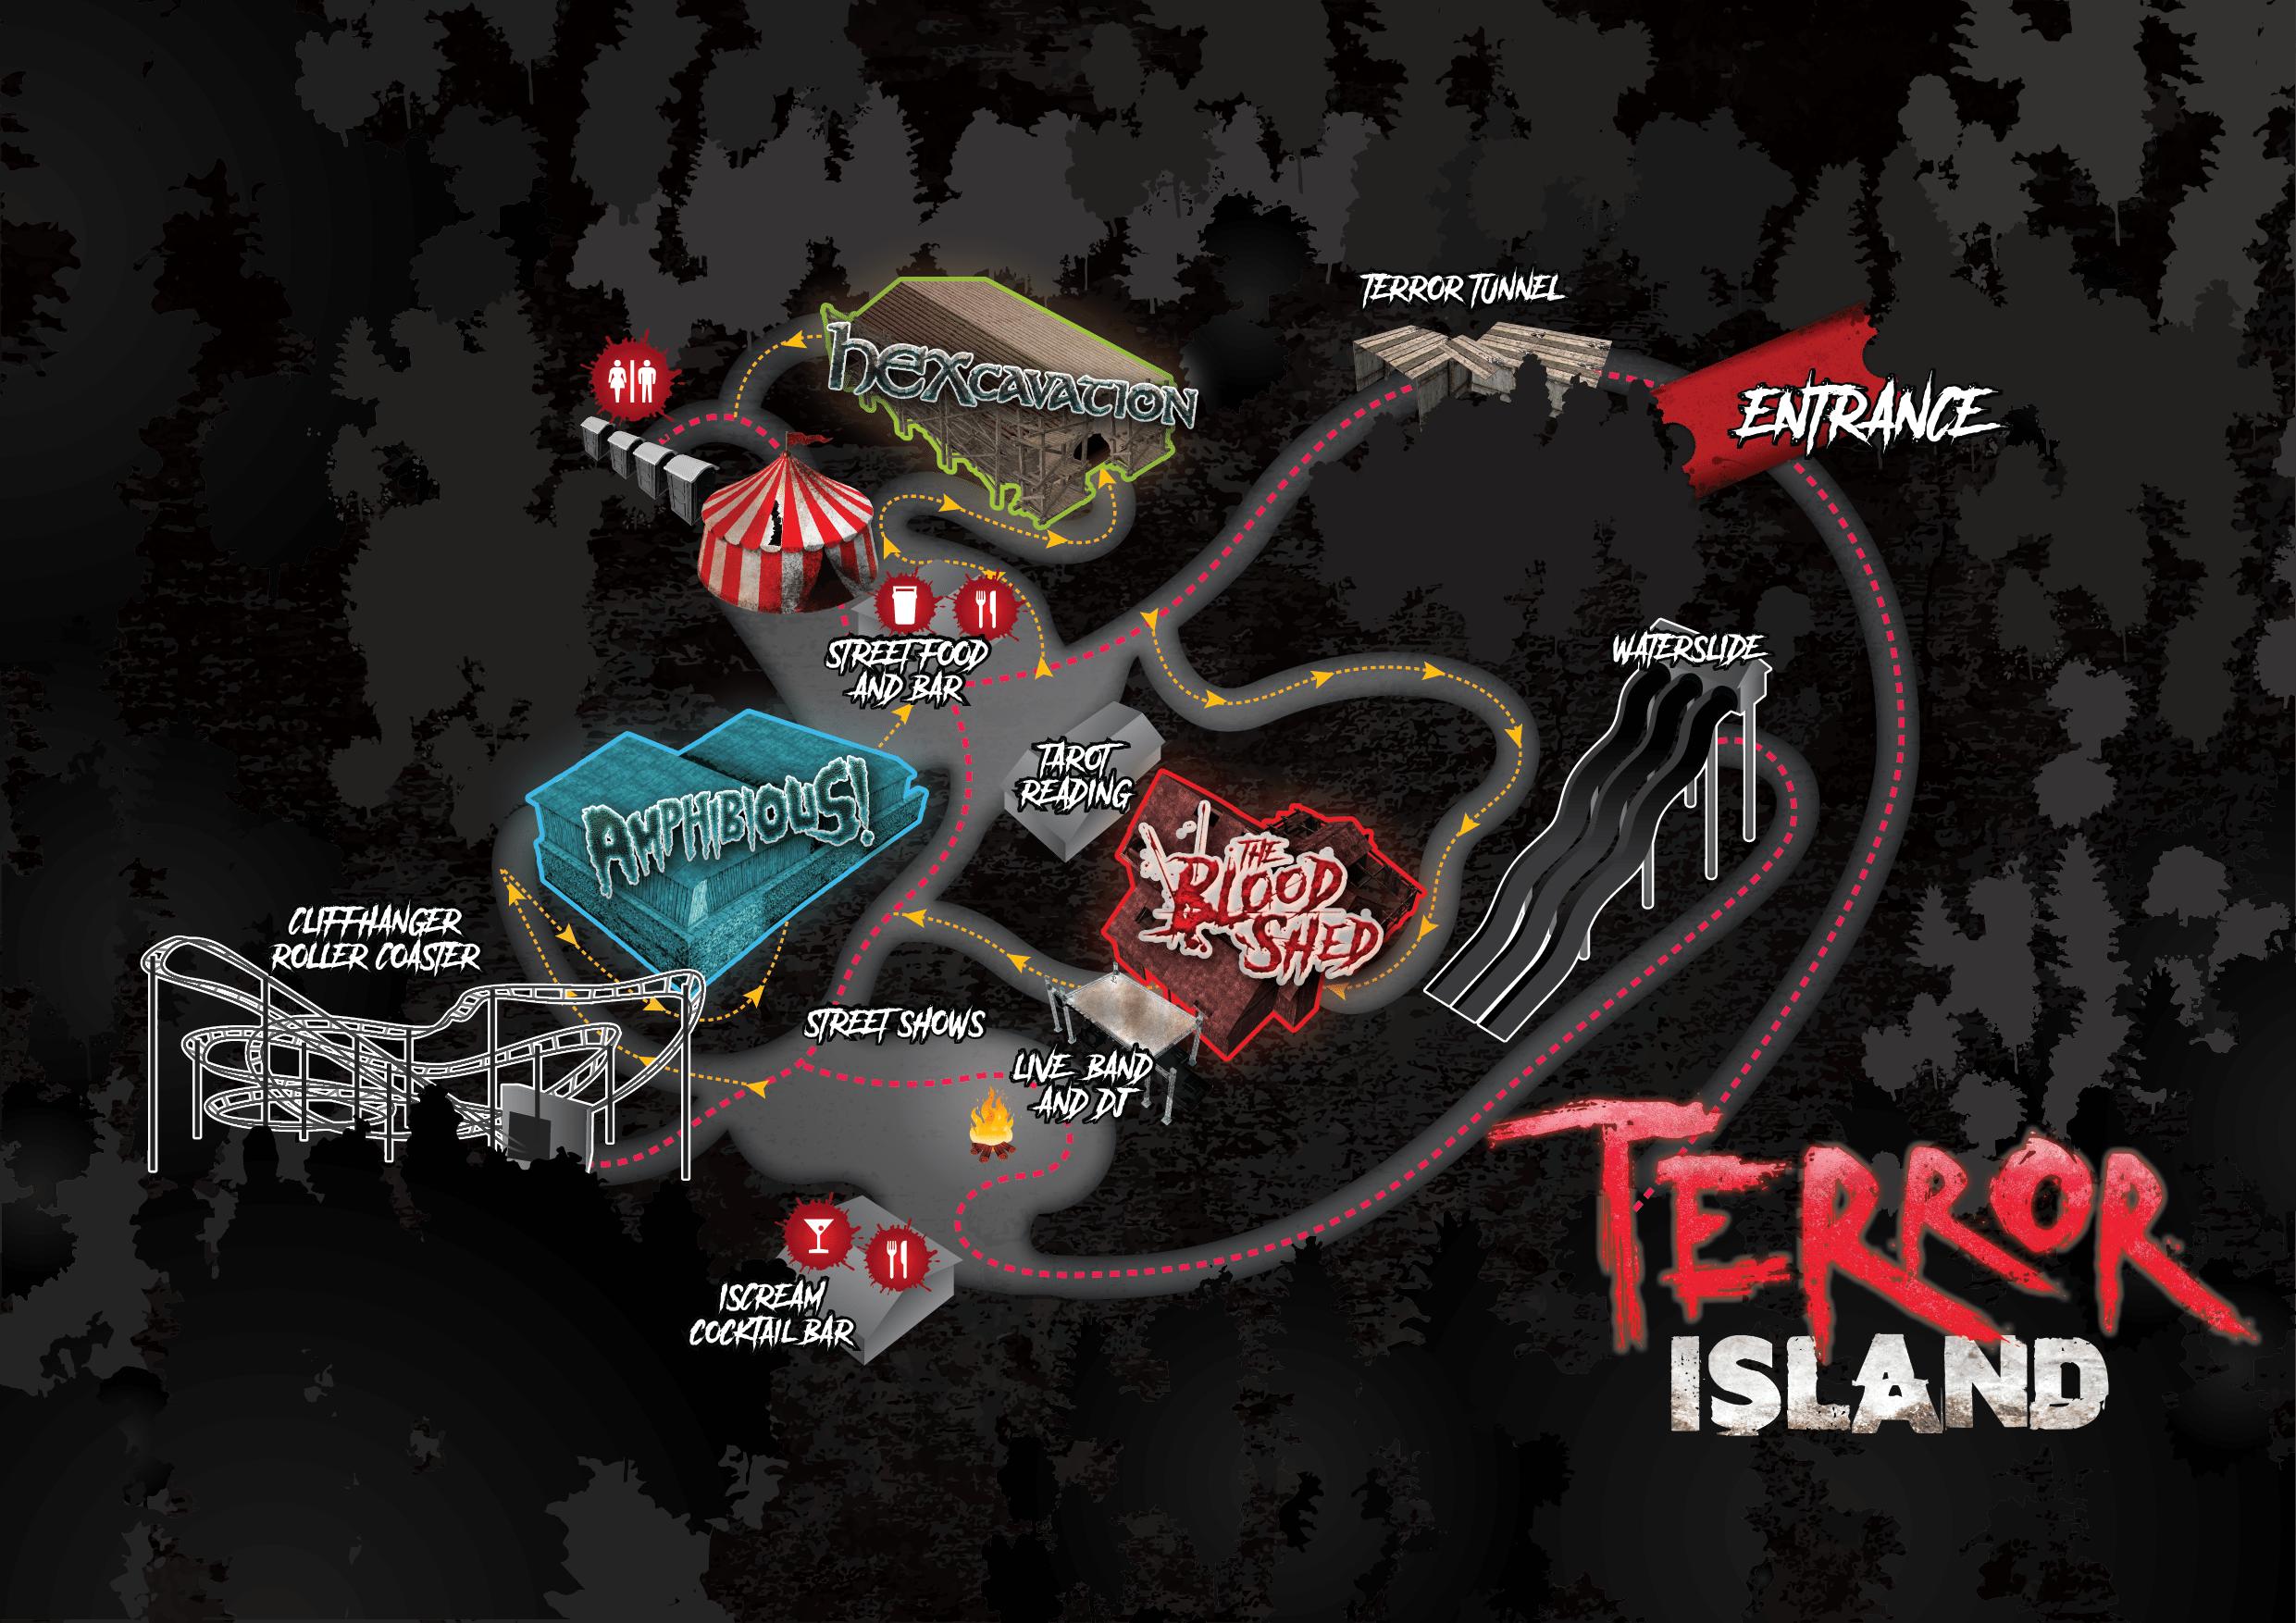 Terror Island Isle of Wight horror scare maze event October Halloween